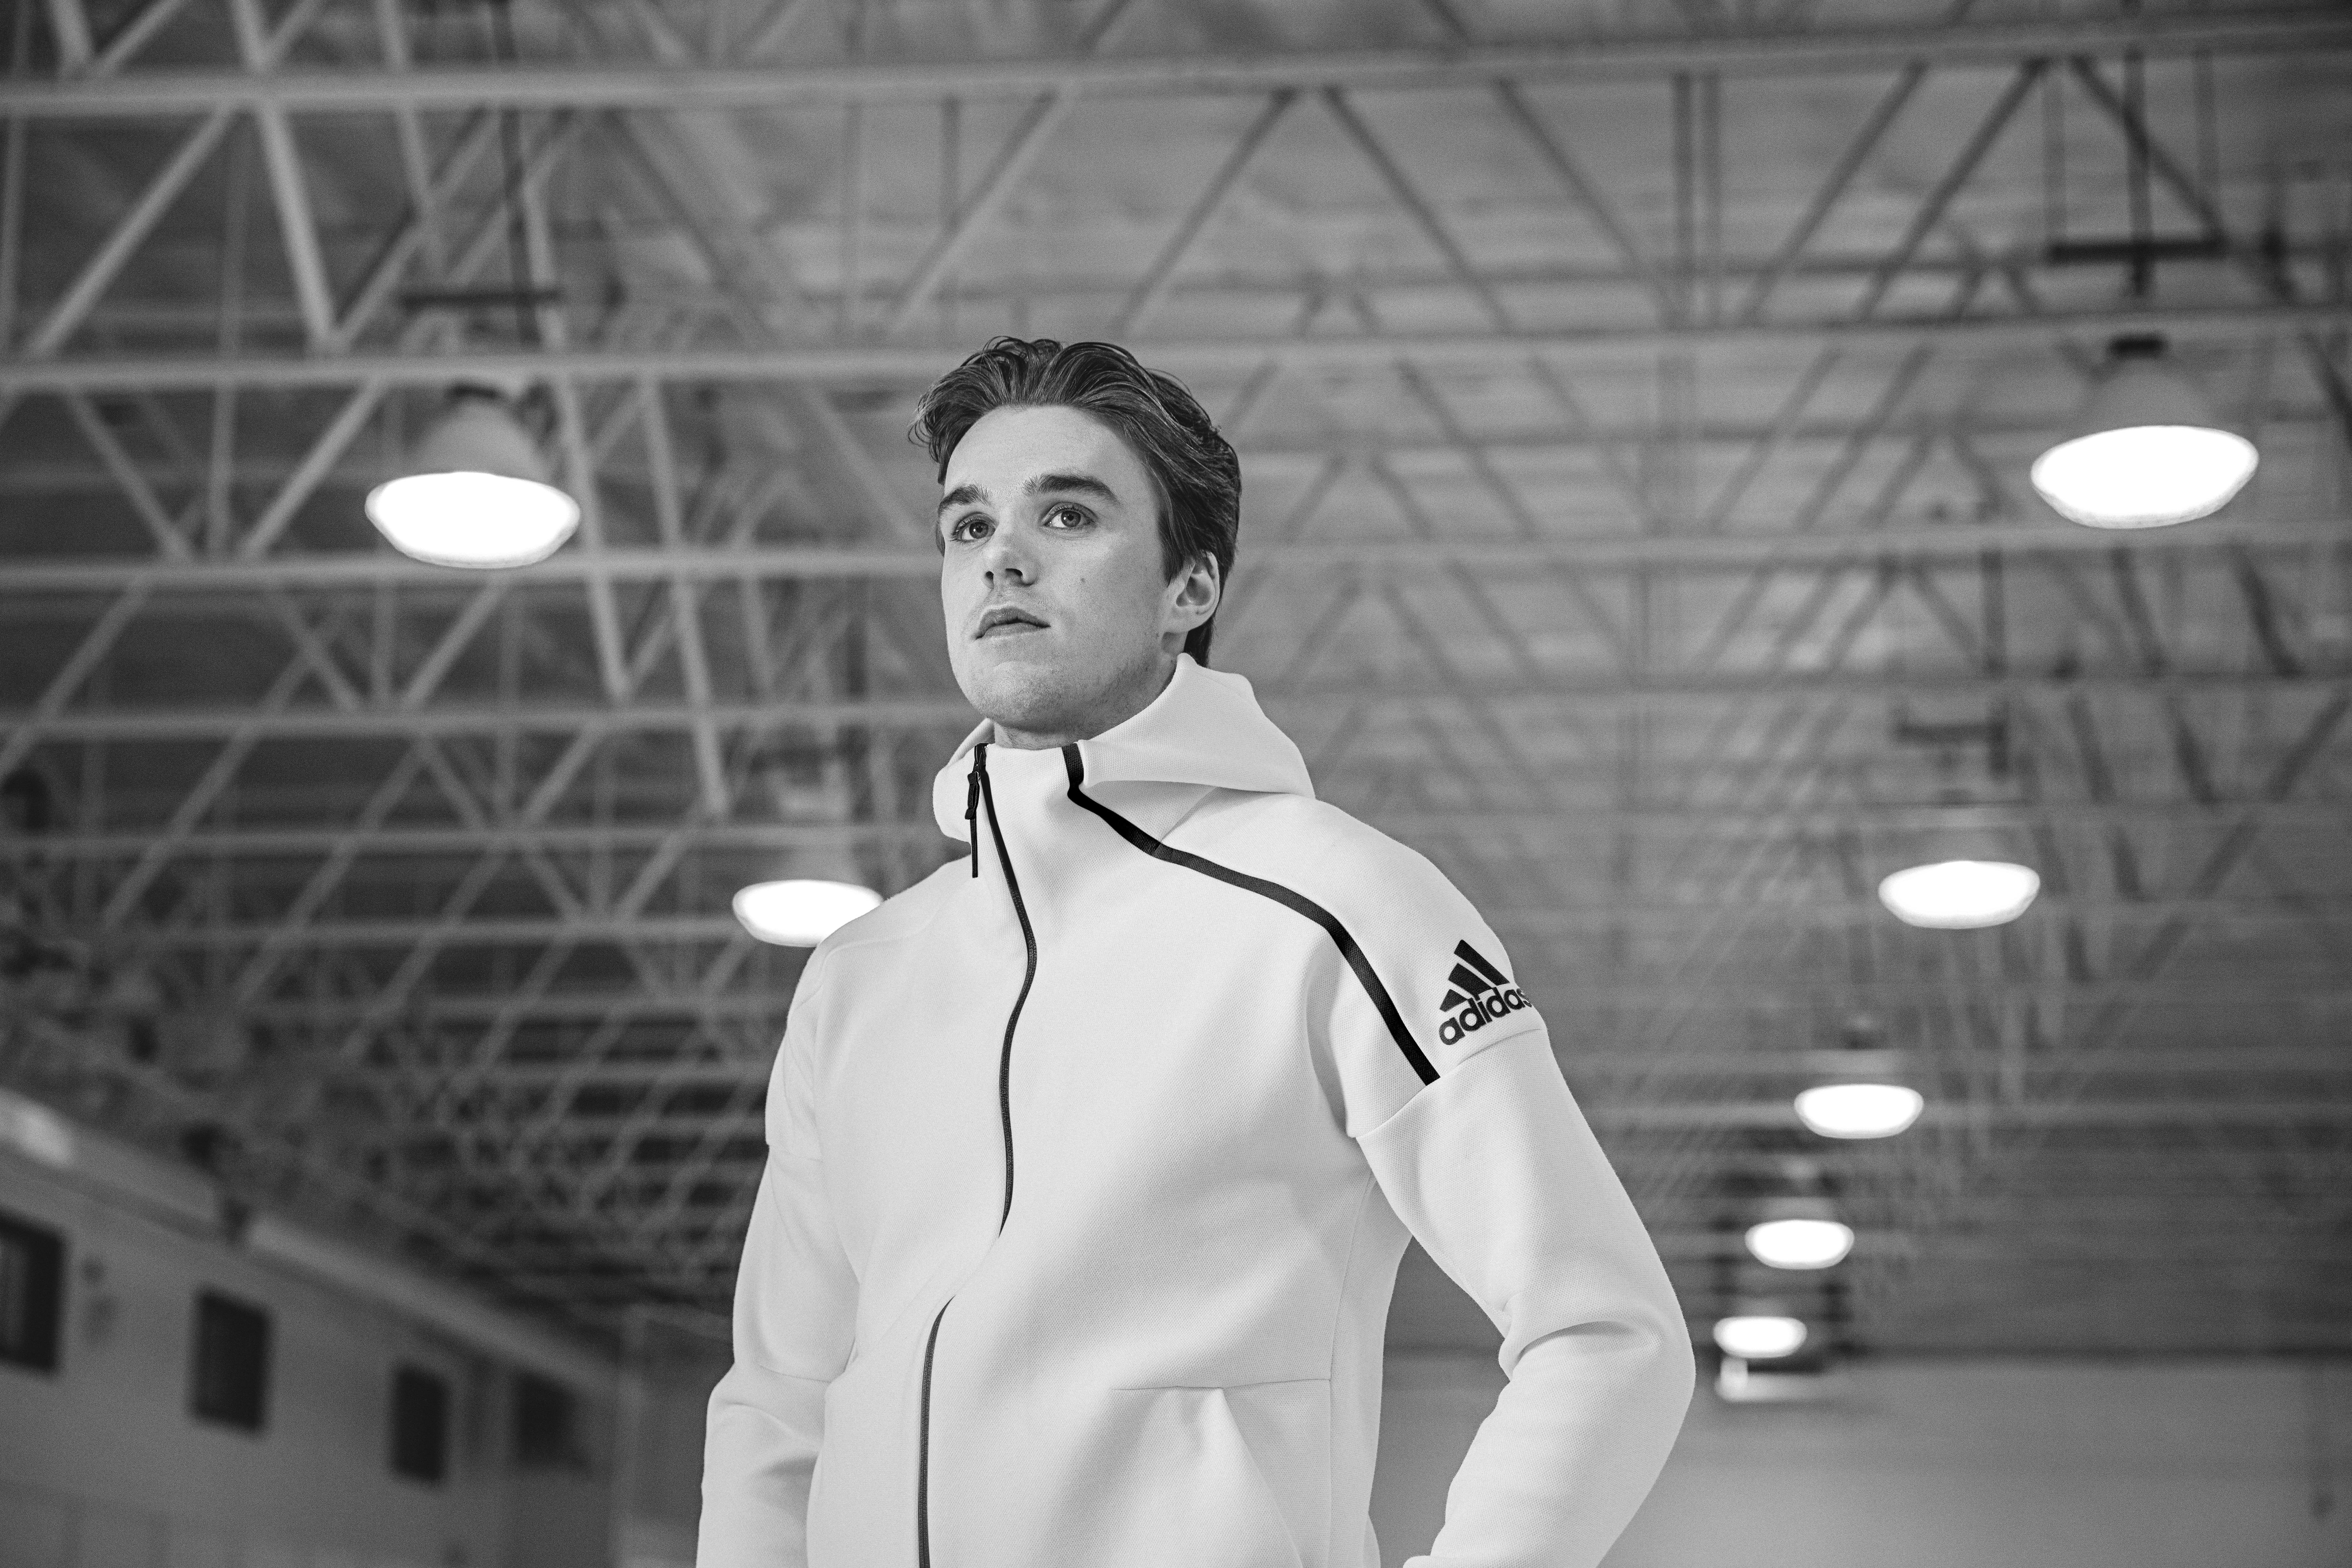 Adidas_McDavid_Edmonton-347_finalV2_B&W-edit